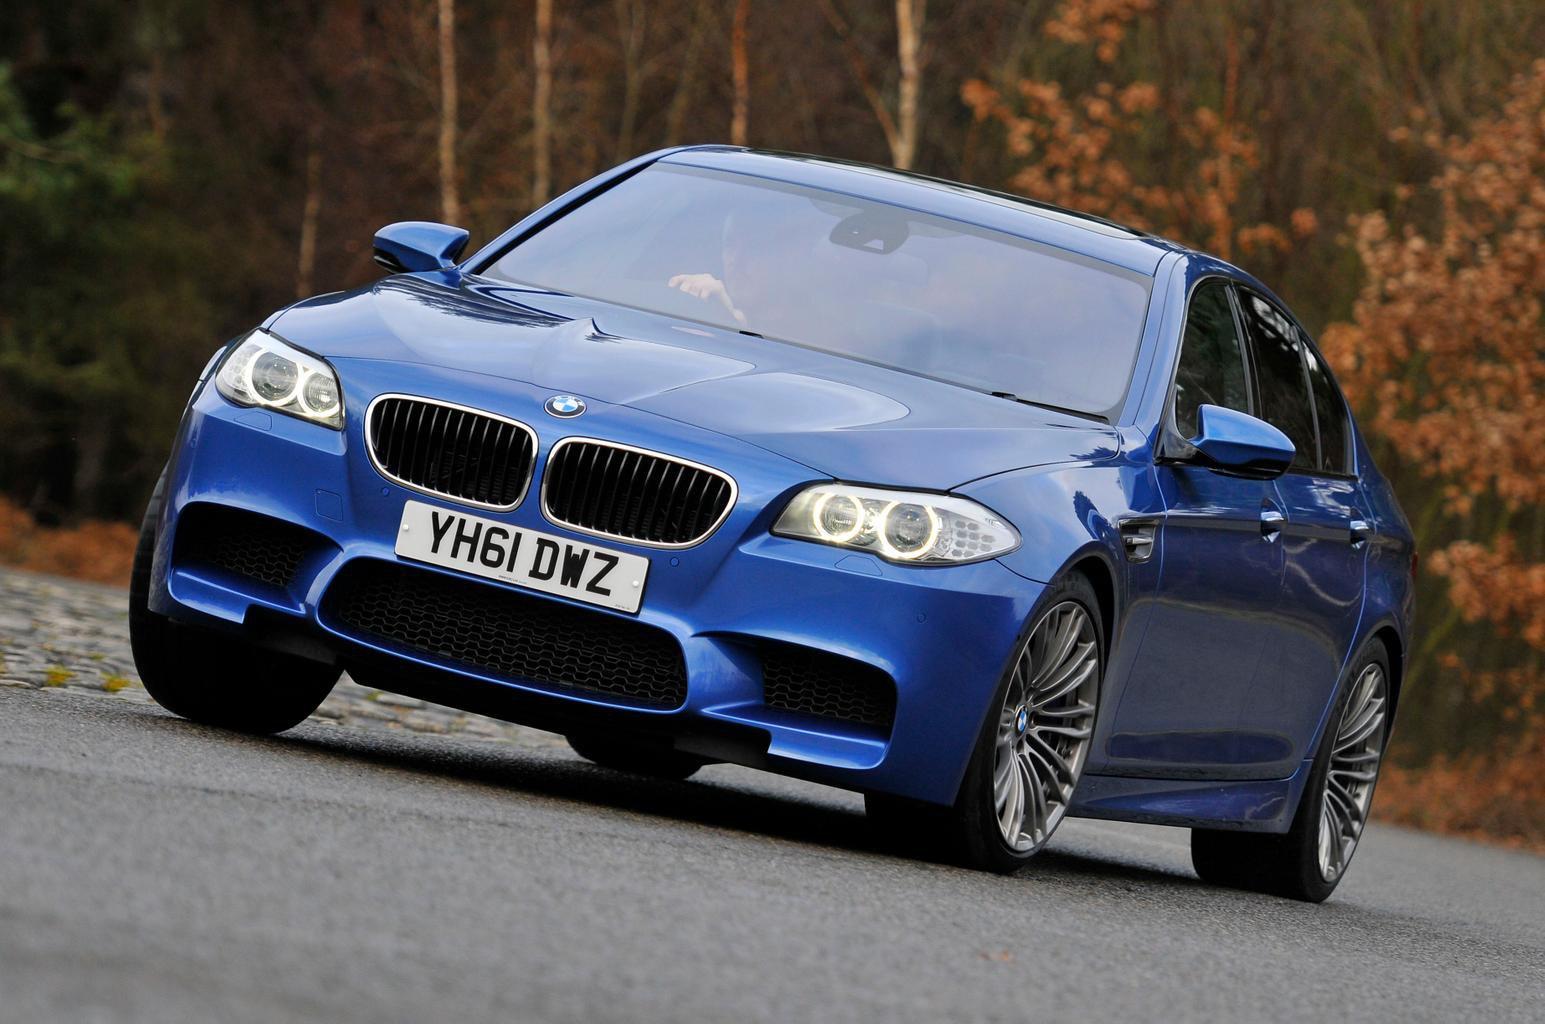 Used test – super saloons: BMW M5 vs Mercedes-Benz E63 AMG